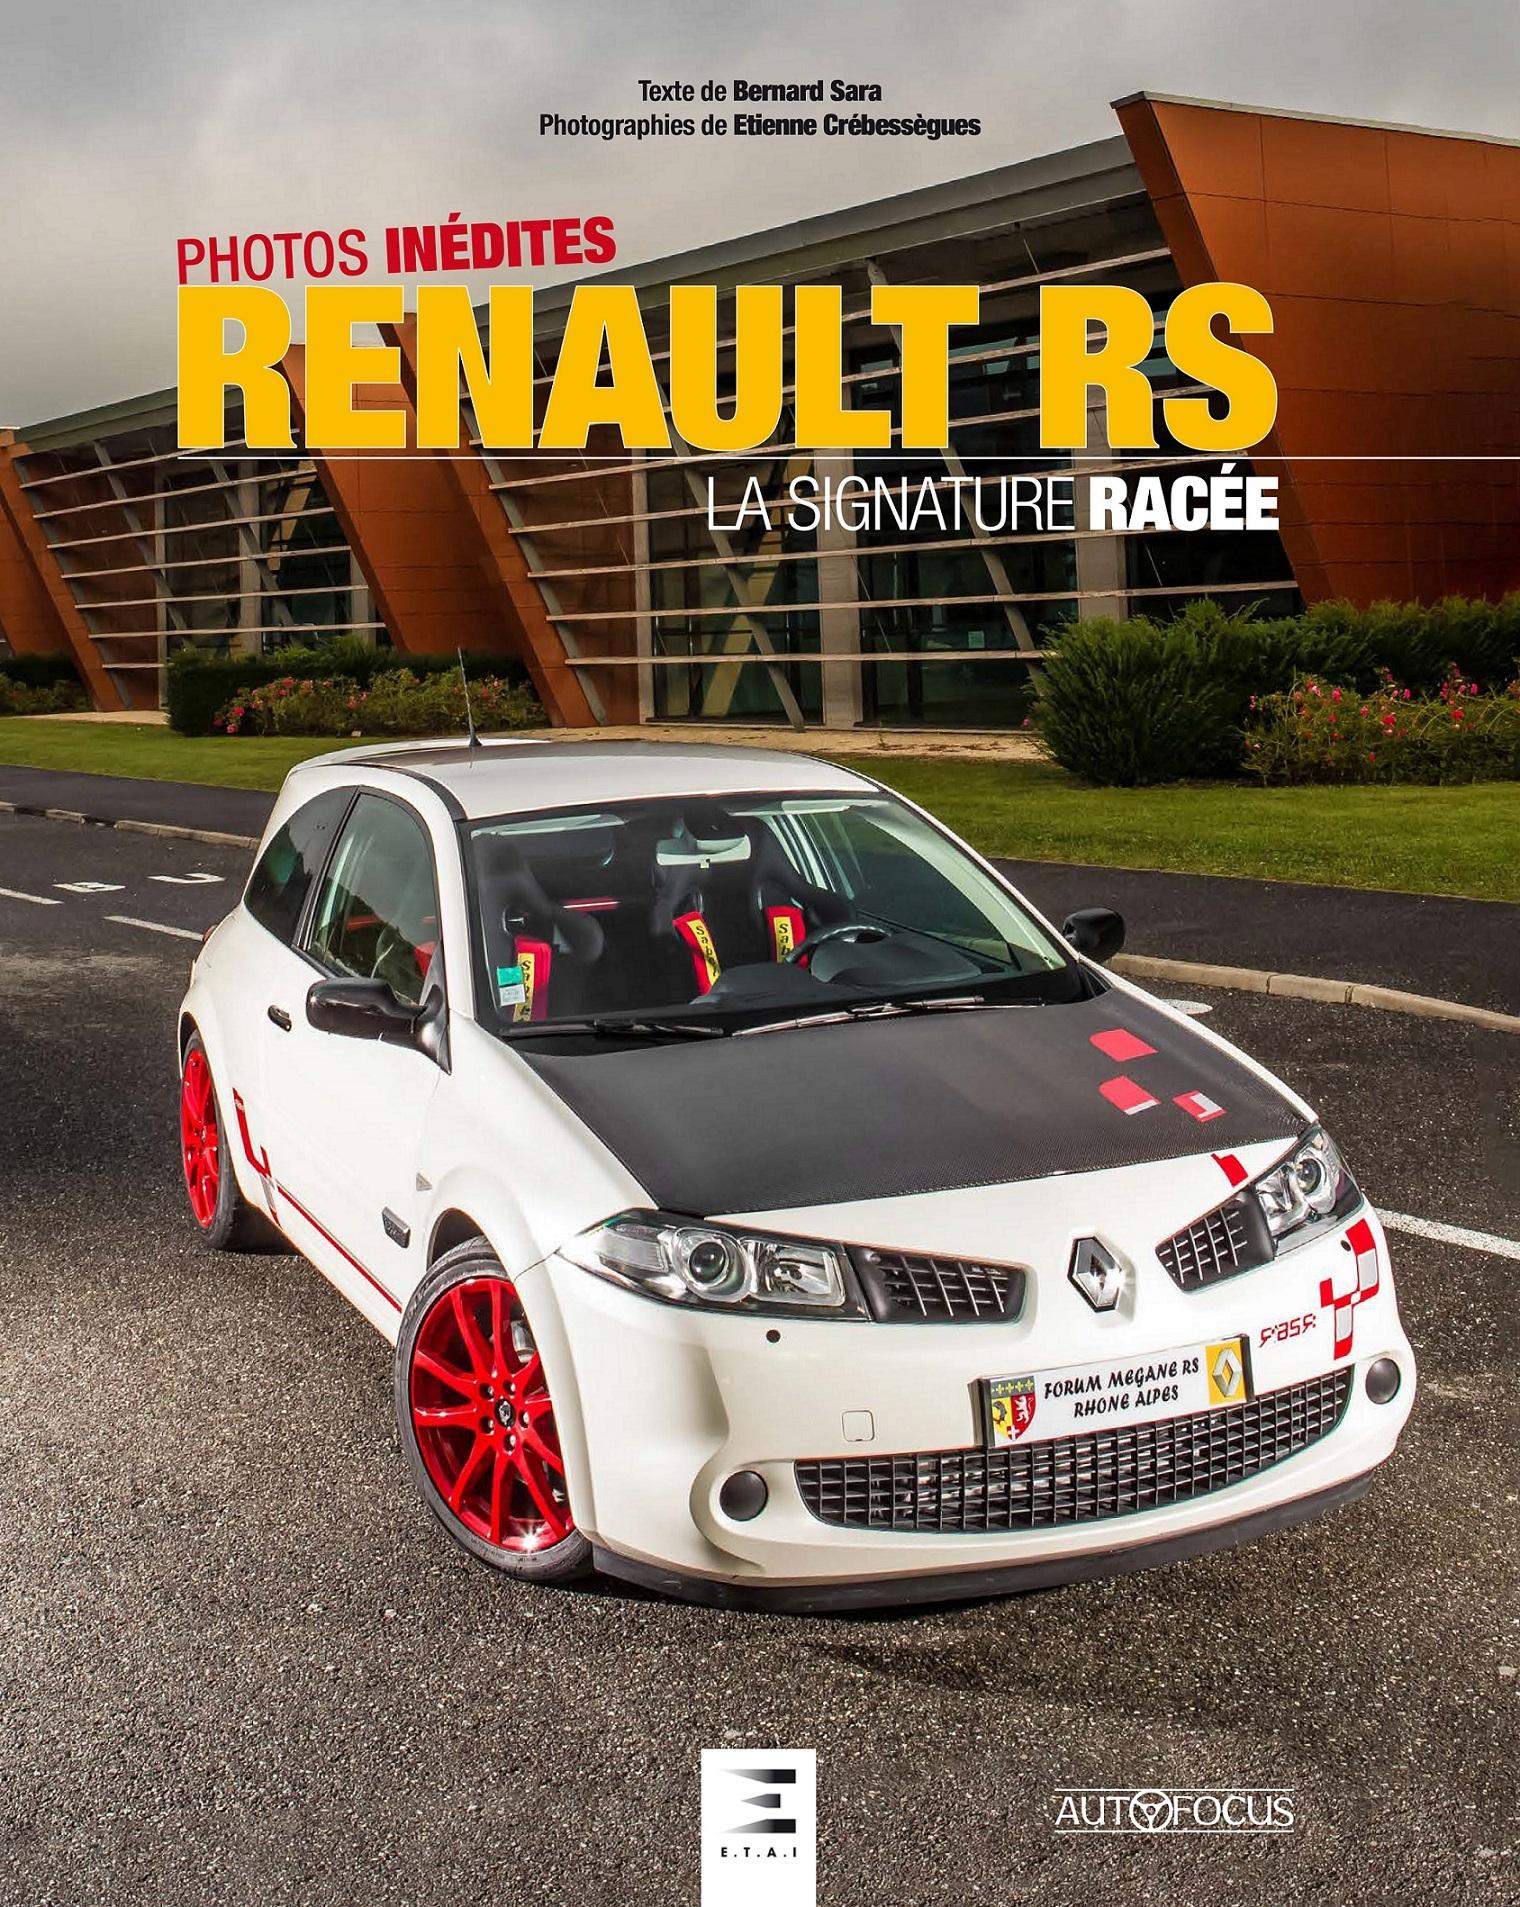 RENAULT RS, LA SIGNATURE RACEE